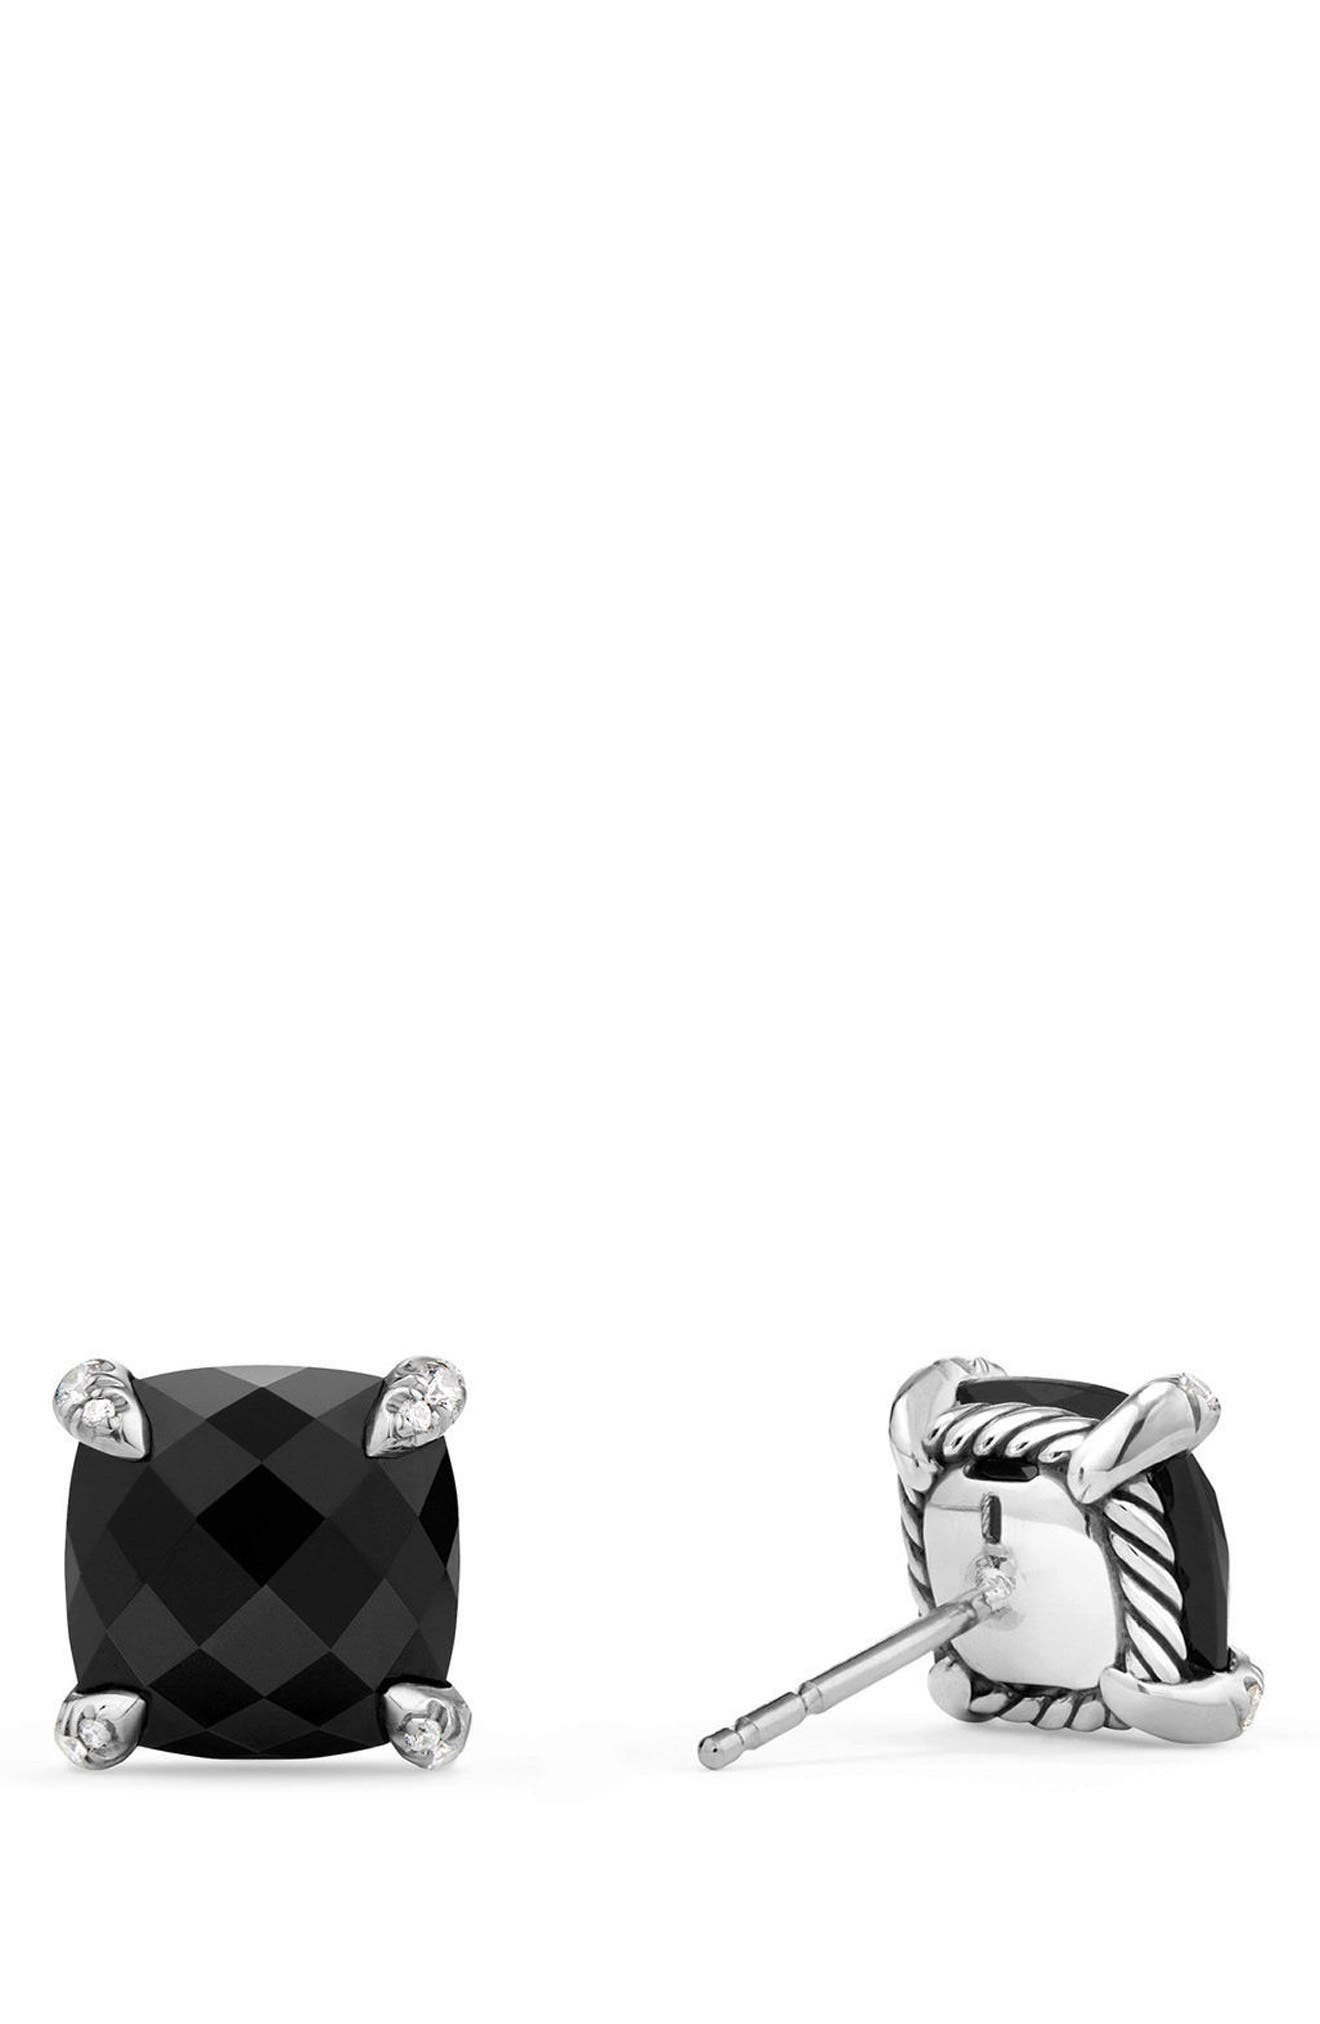 Alternate Image 2  - David Yurman Châtelaine Earrings with Diamonds